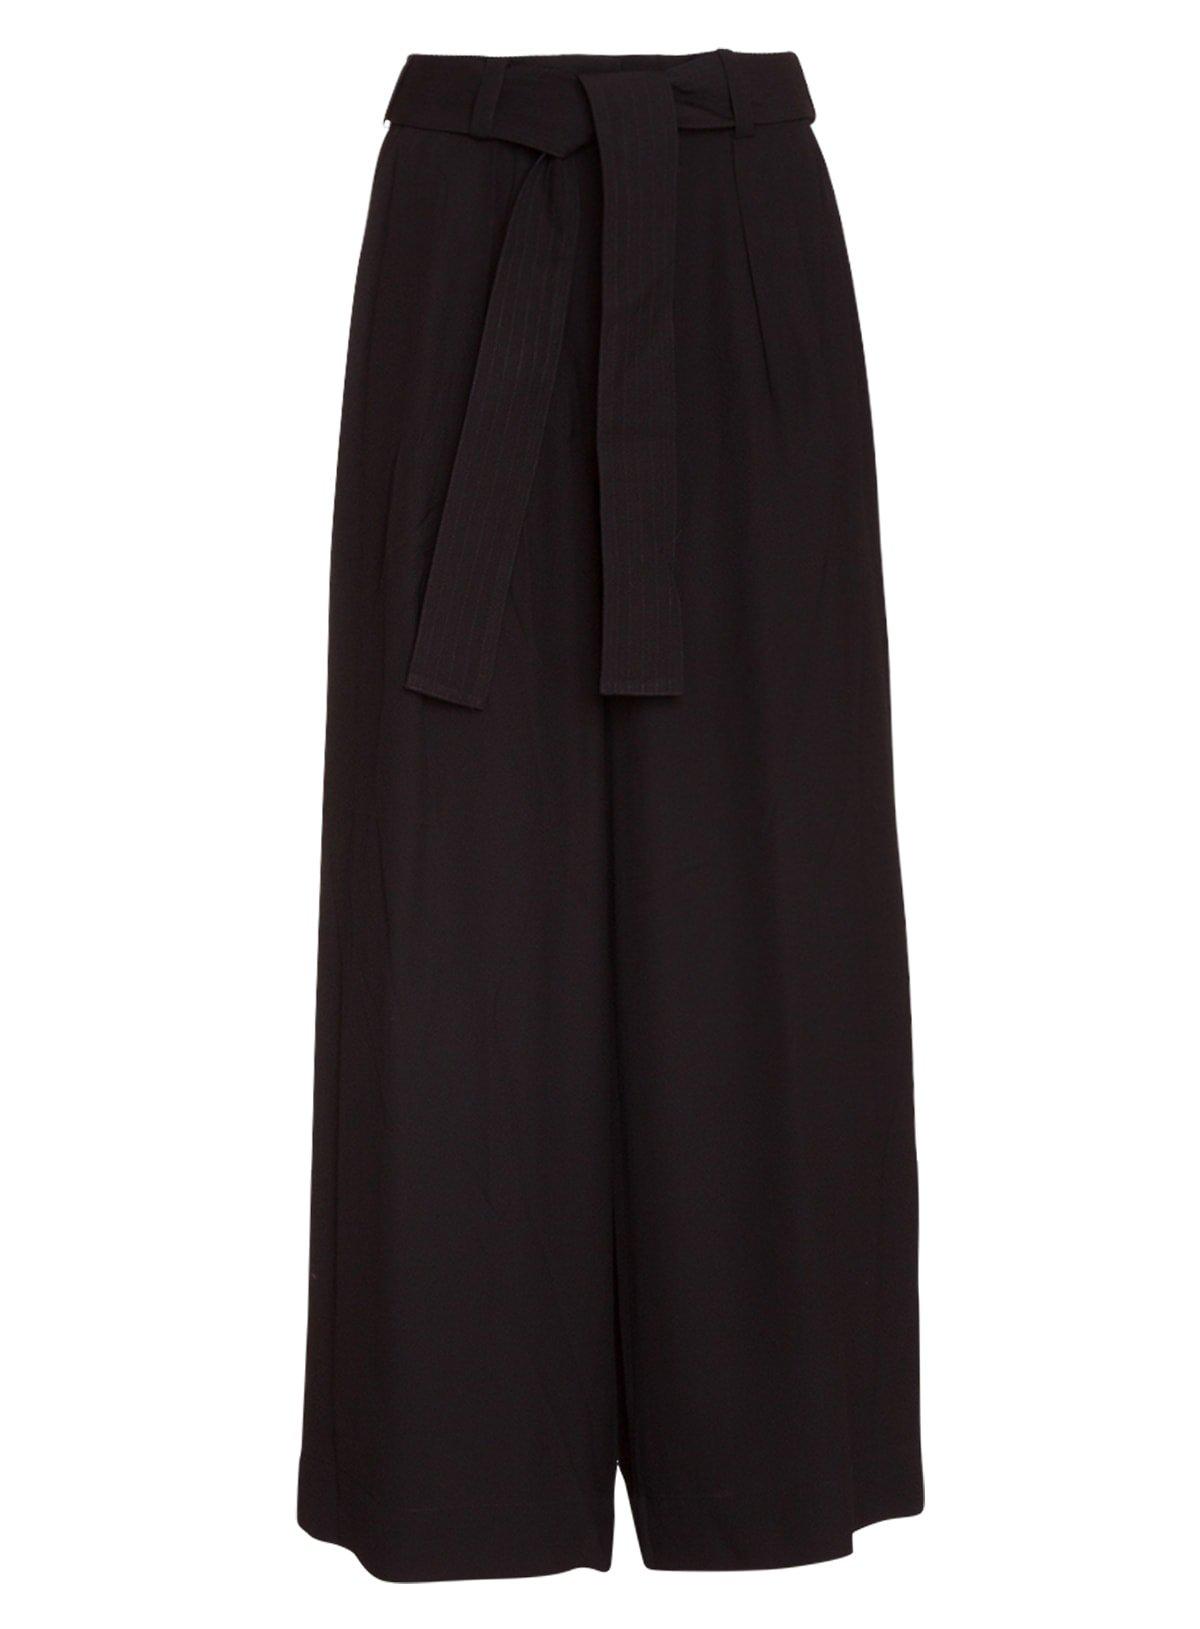 Zimmermann Pants In Black Cotton